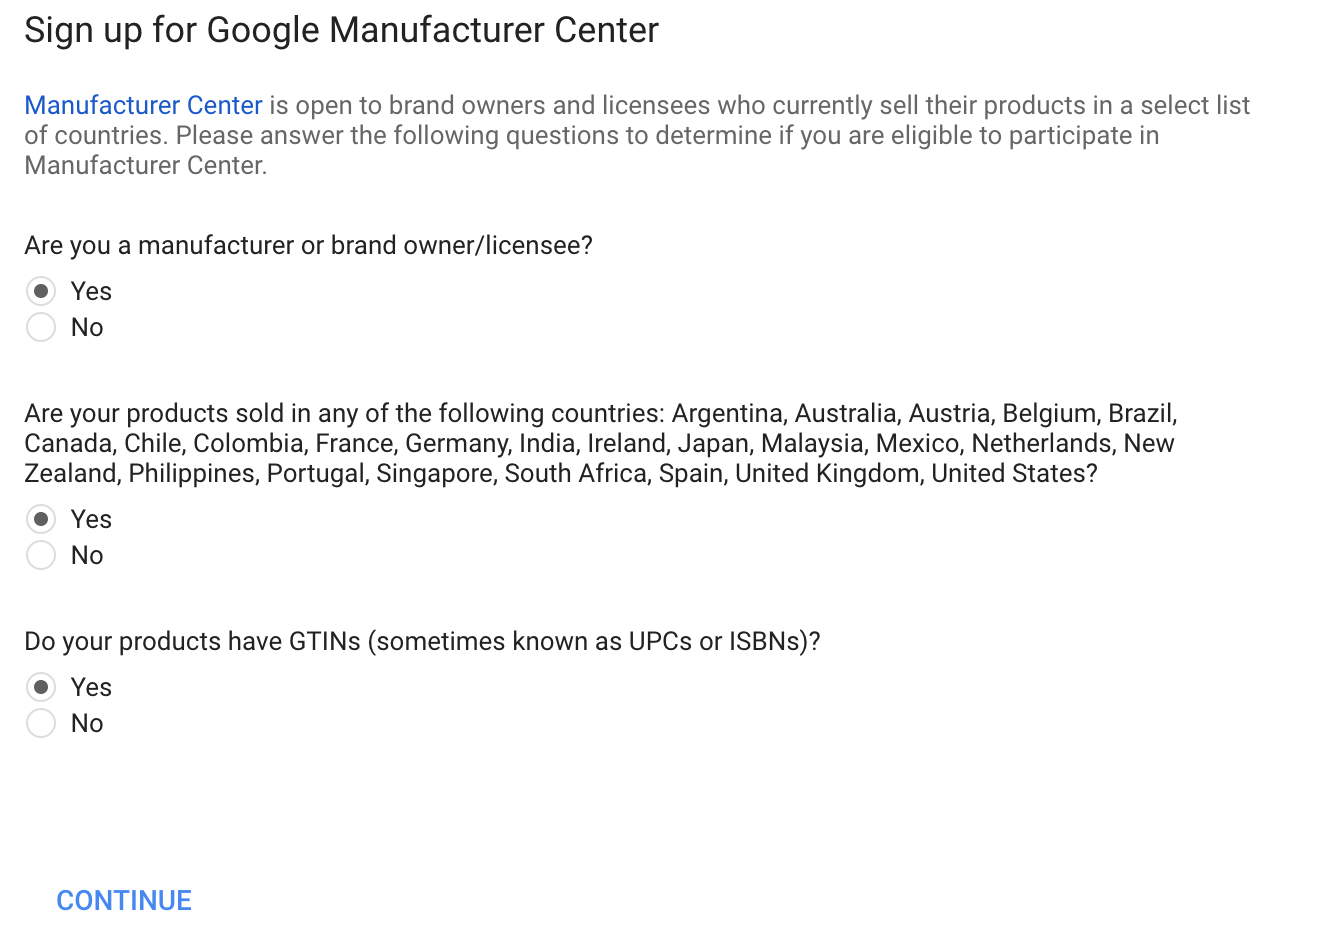 How Does Google Manufacturer Center Work?